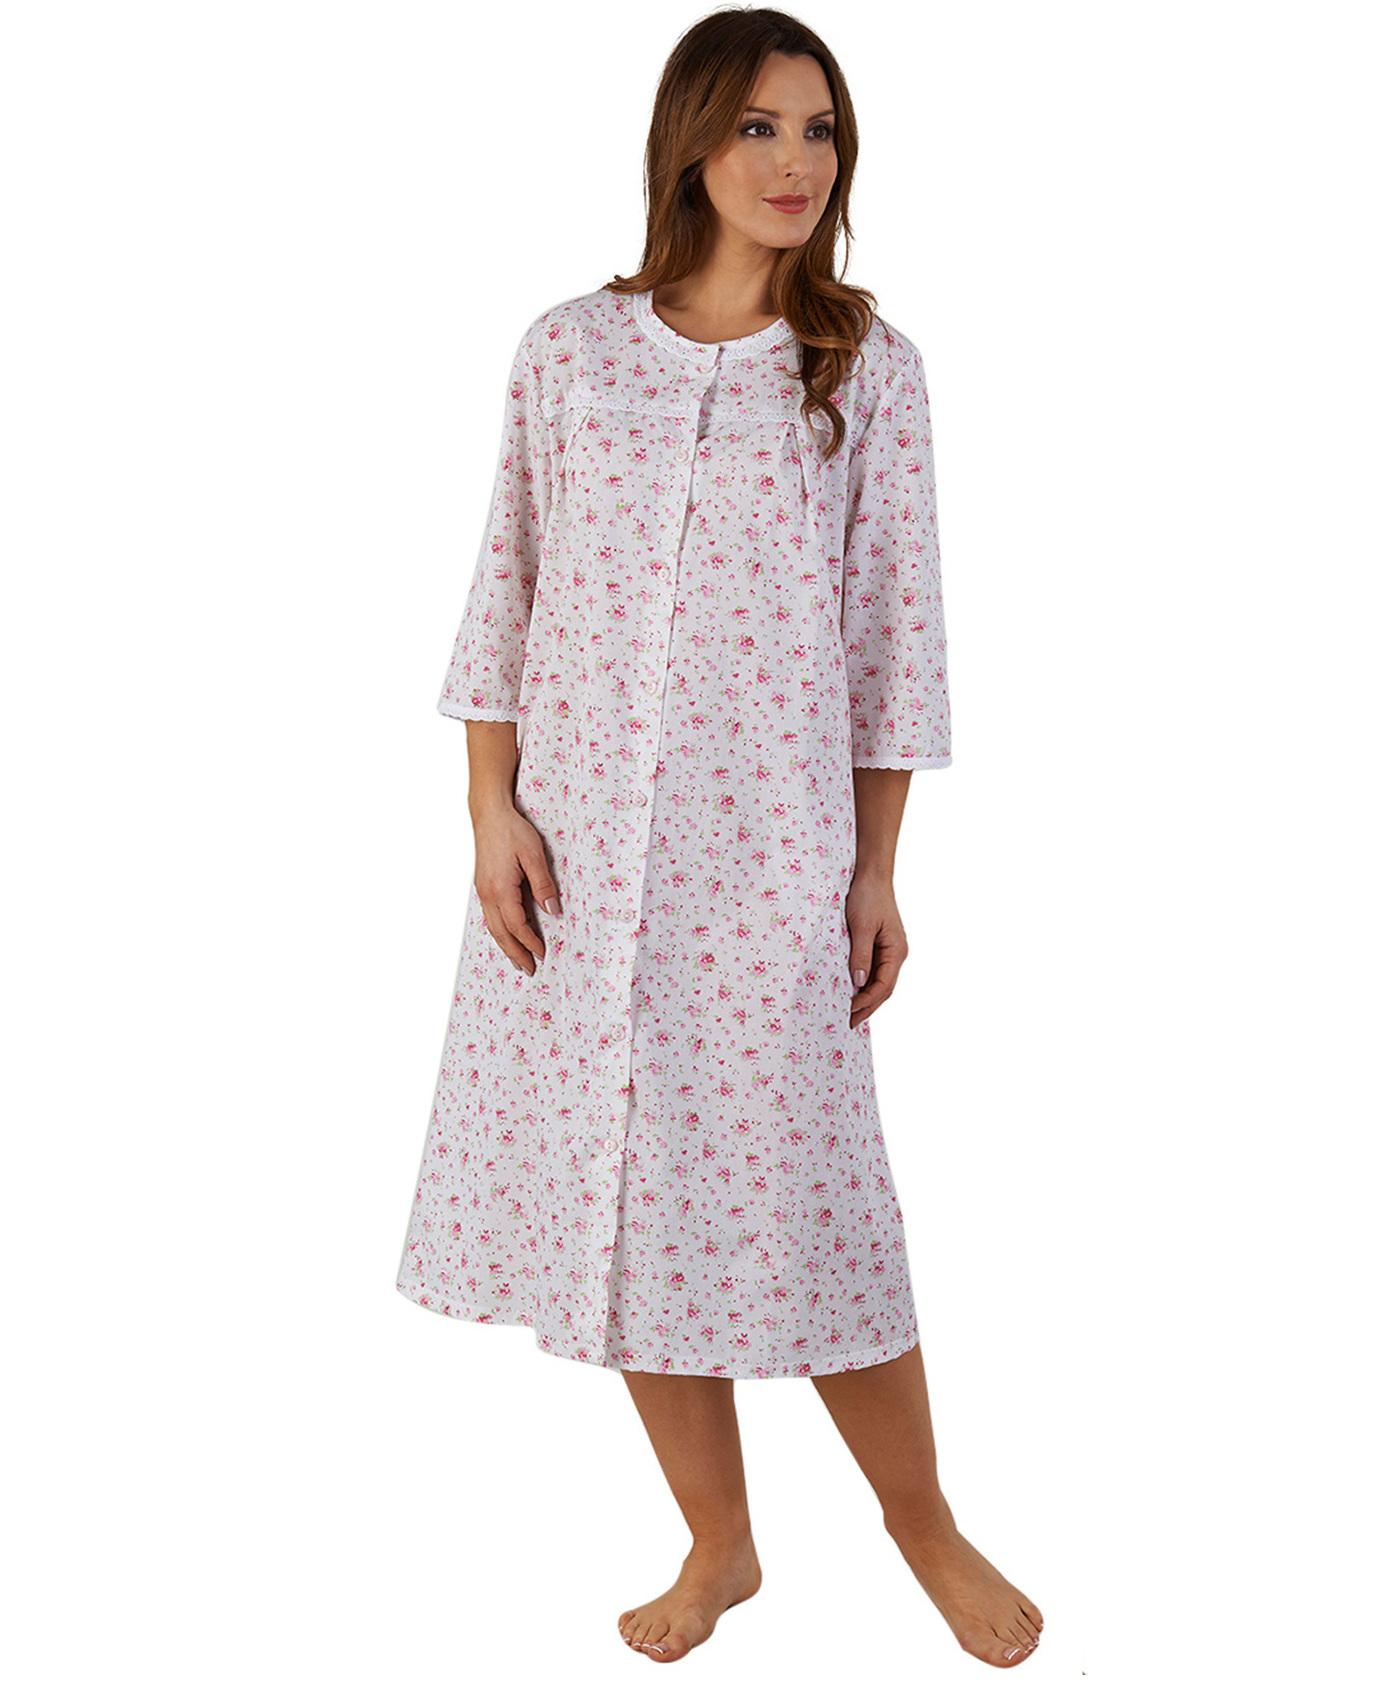 damen blumen bademantel gekn pft spitzenrand 3 4 rmel polycotton robe ebay. Black Bedroom Furniture Sets. Home Design Ideas